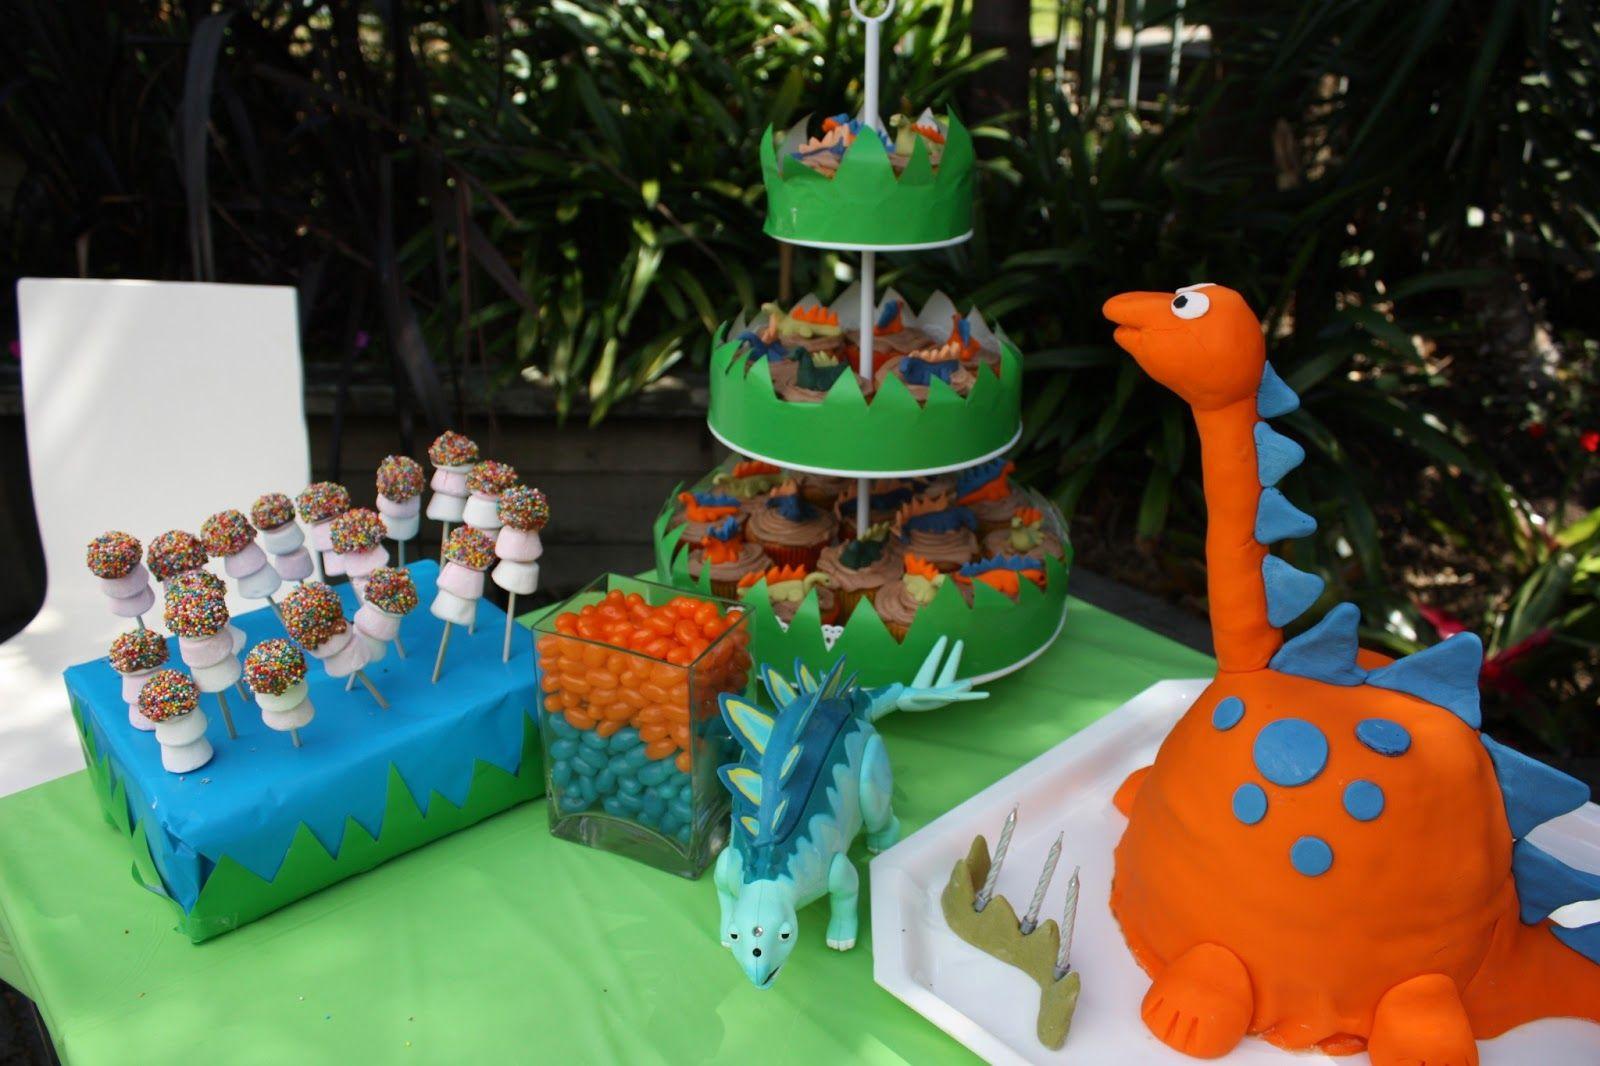 Dinosaur birthday cake at a dinosaur themed party